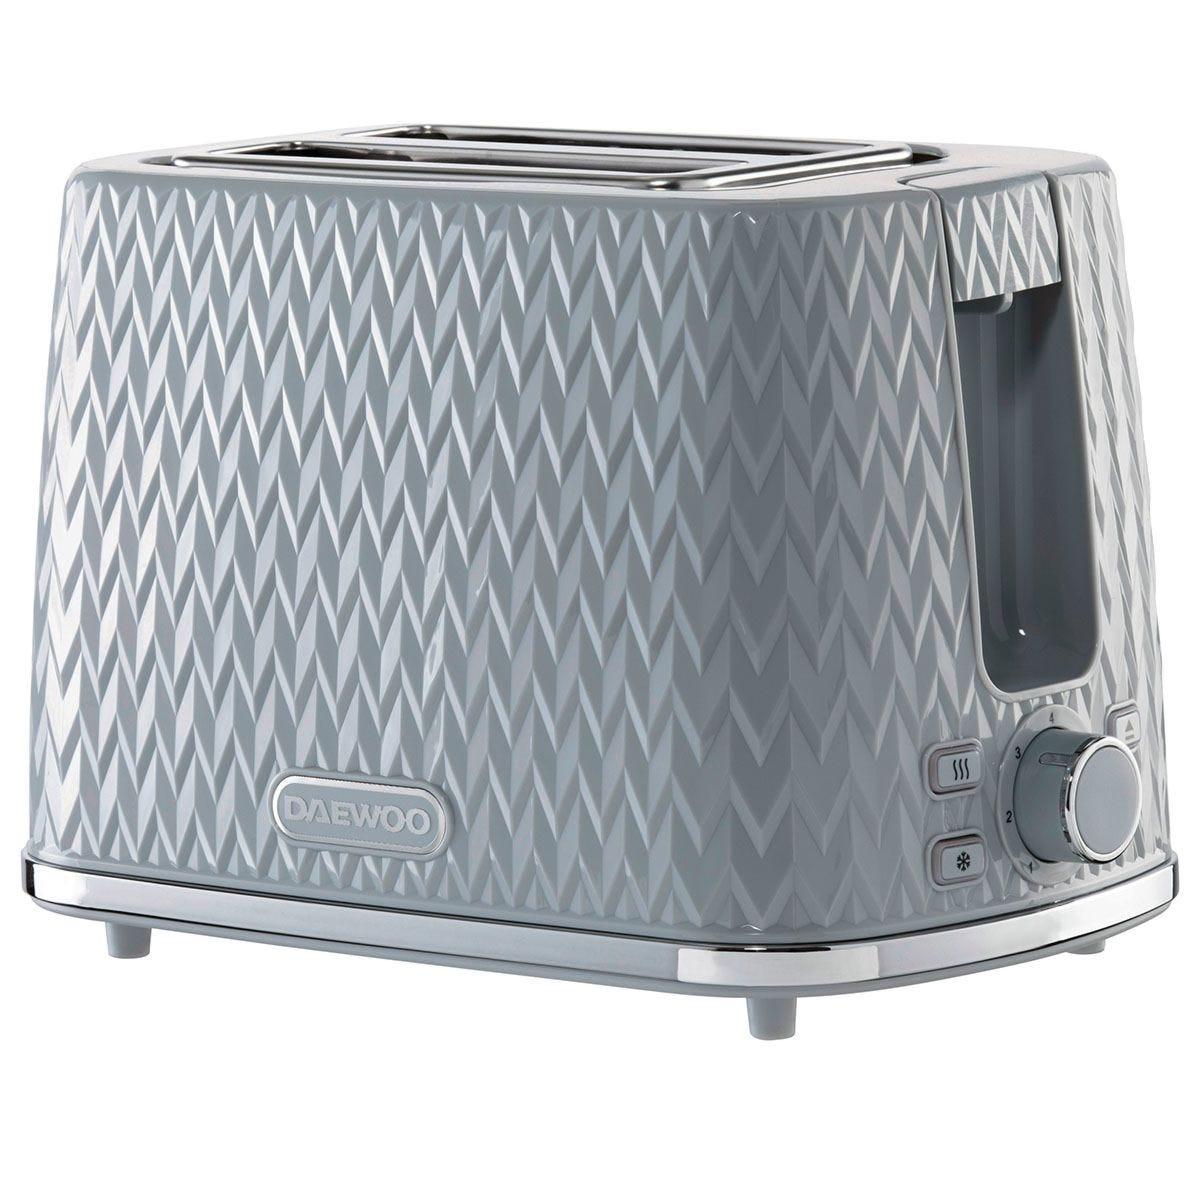 Daewoo Argyle 2-Slice Toaster - Grey